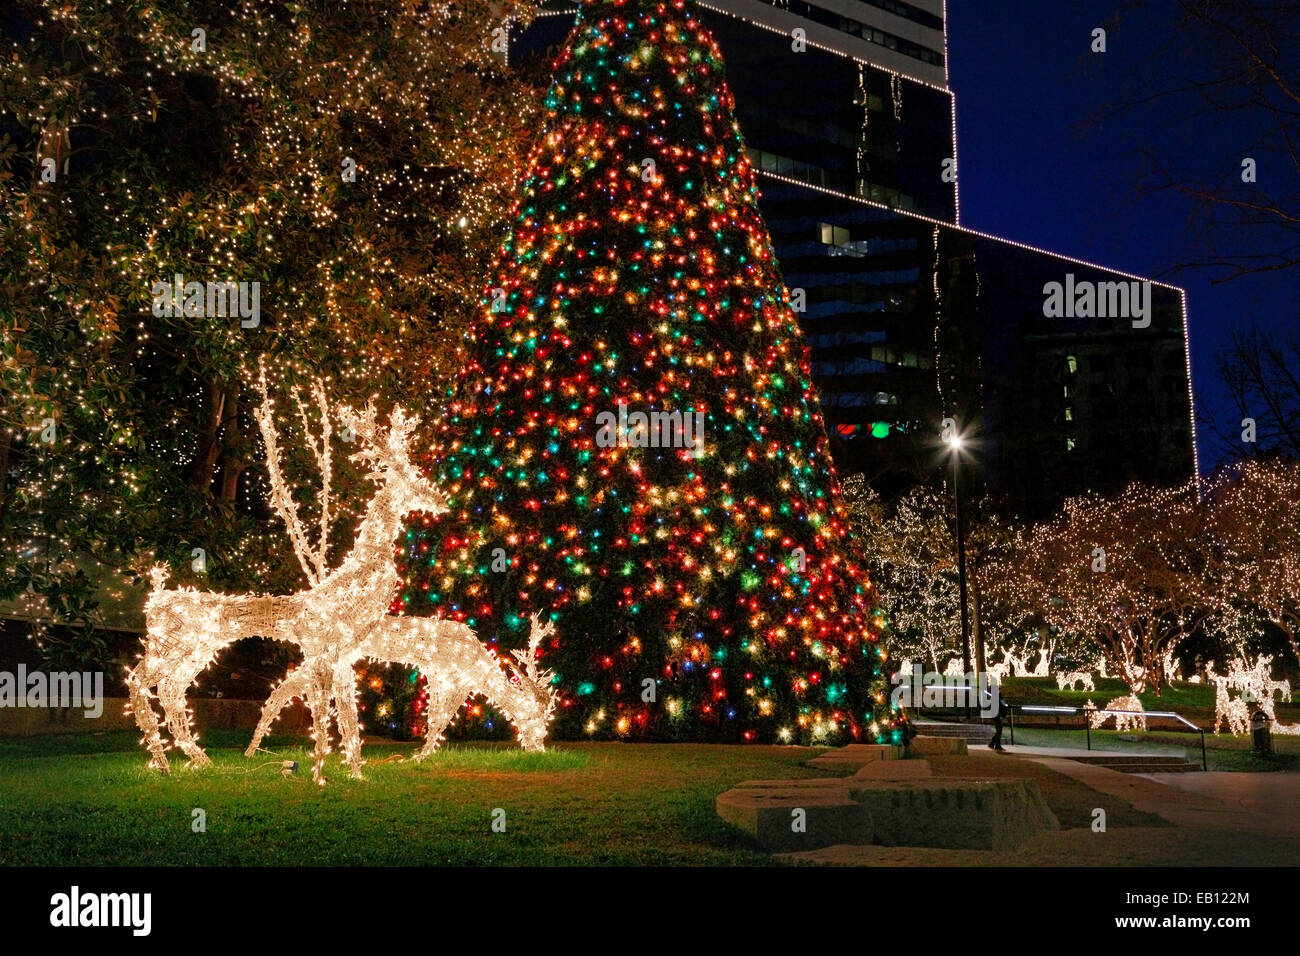 christmas-lights-in-downtown-richmond-virginia-EB122M.jpg